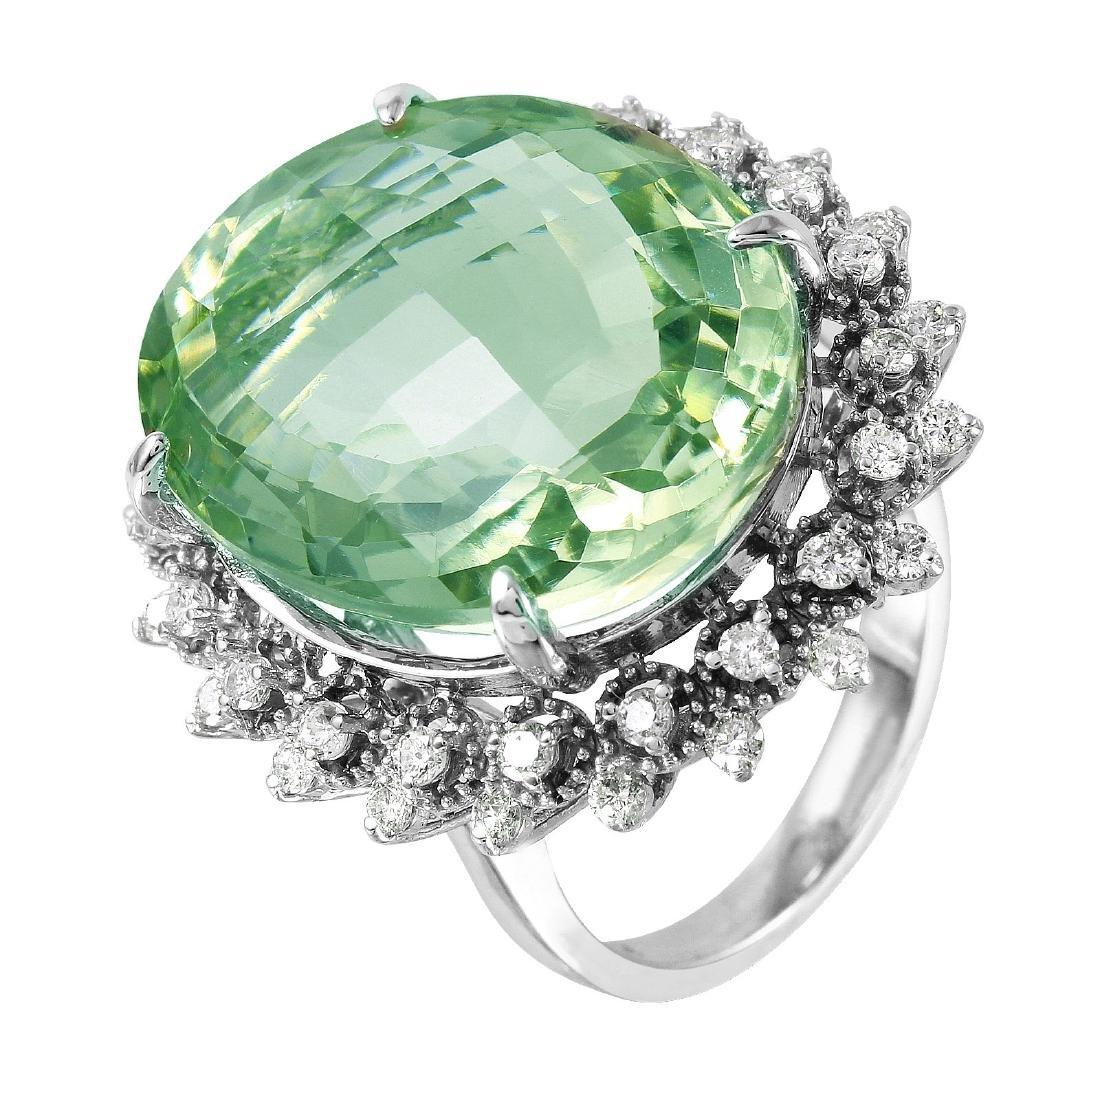 14KT White Gold Amethyst & Diamond Ring